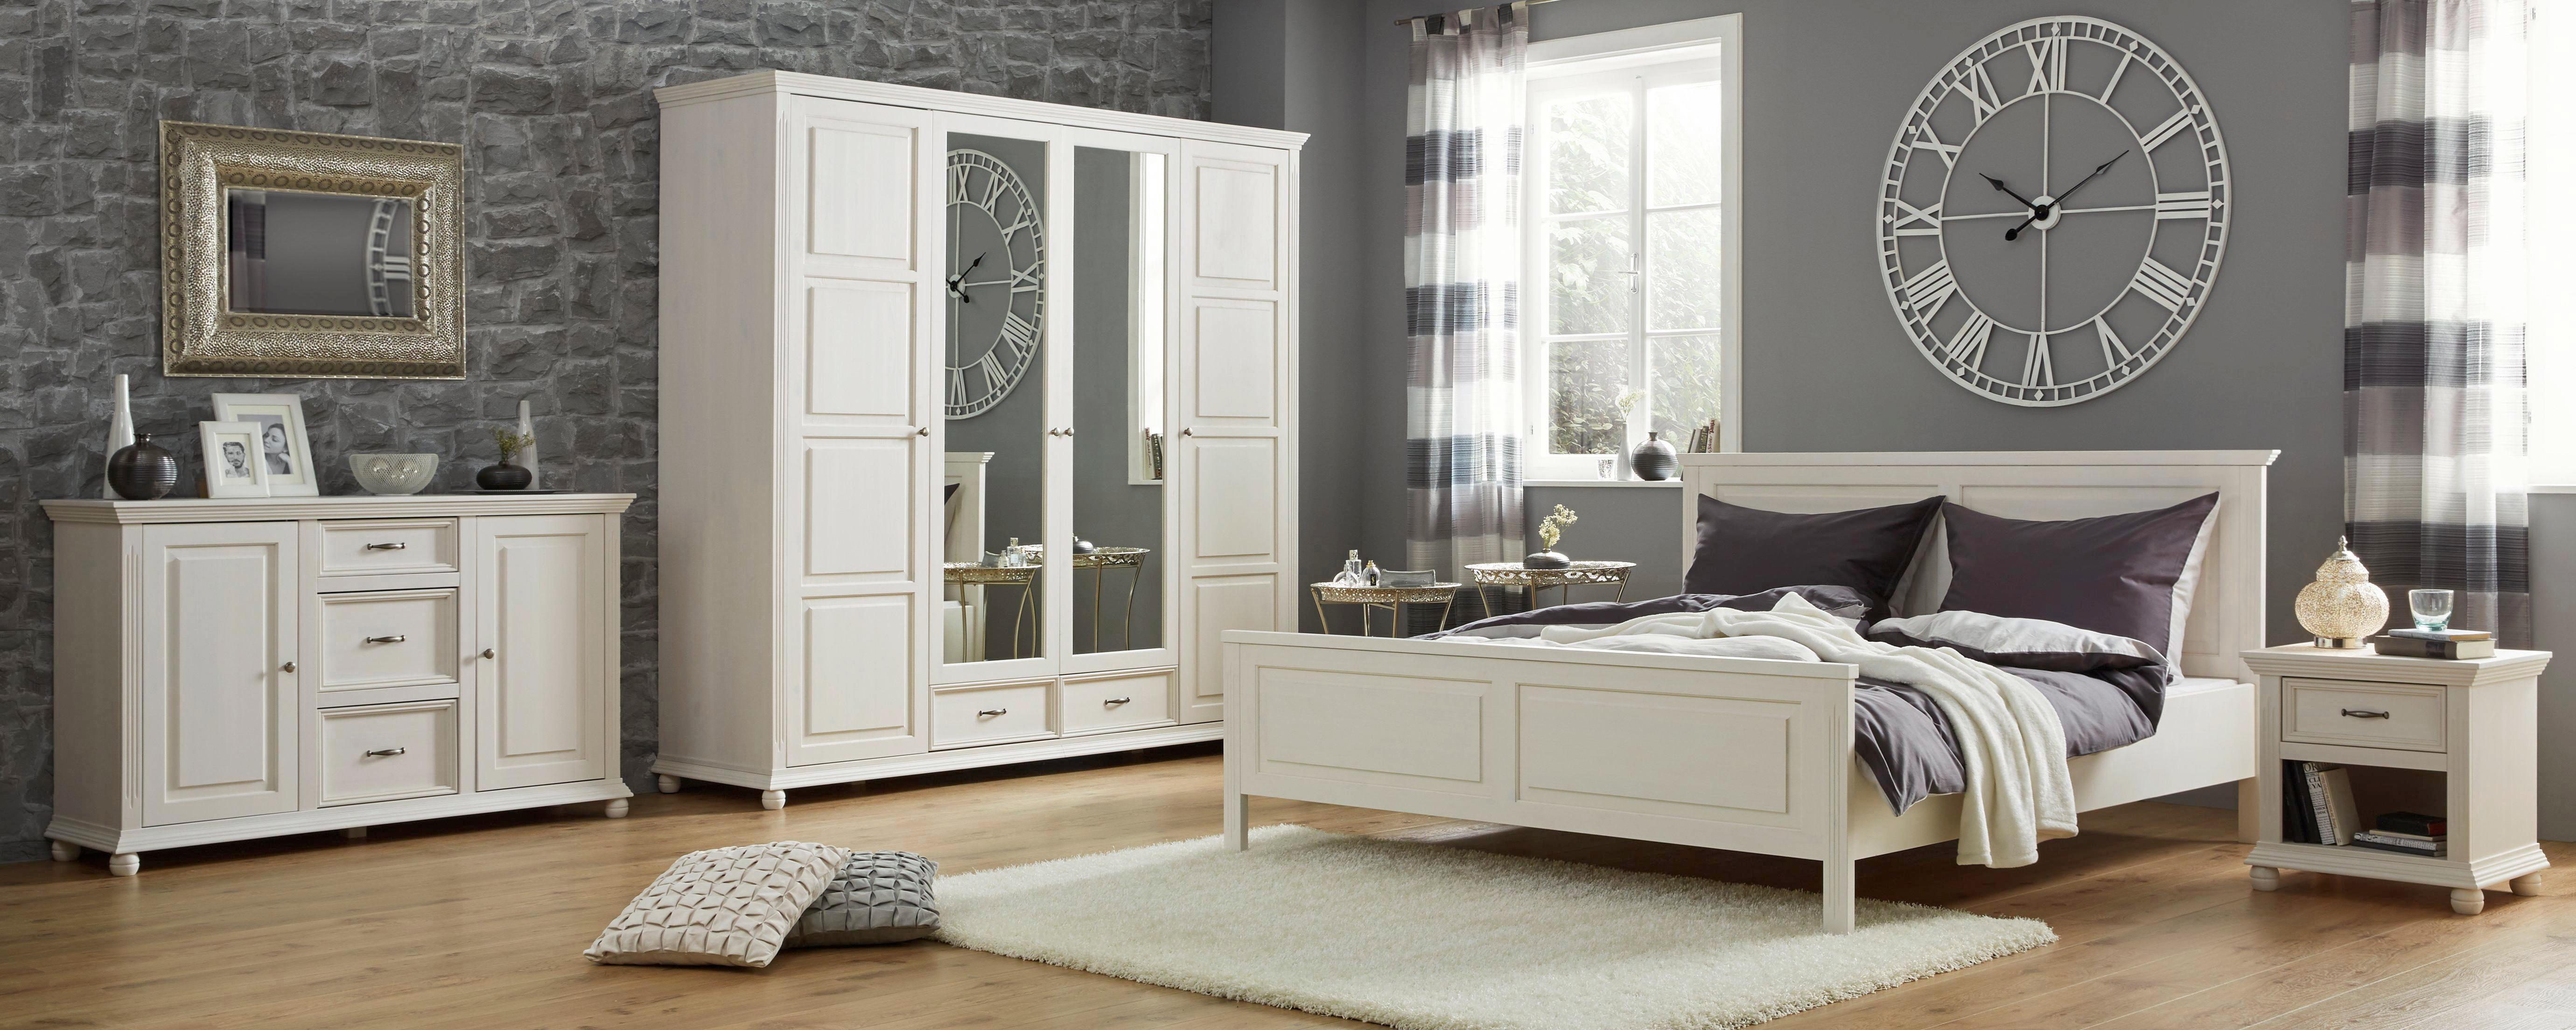 Wandspiegel ca. 70x90x5,5cm - Silberfarben, Metall (70/90/5,5cm) - MÖMAX modern living